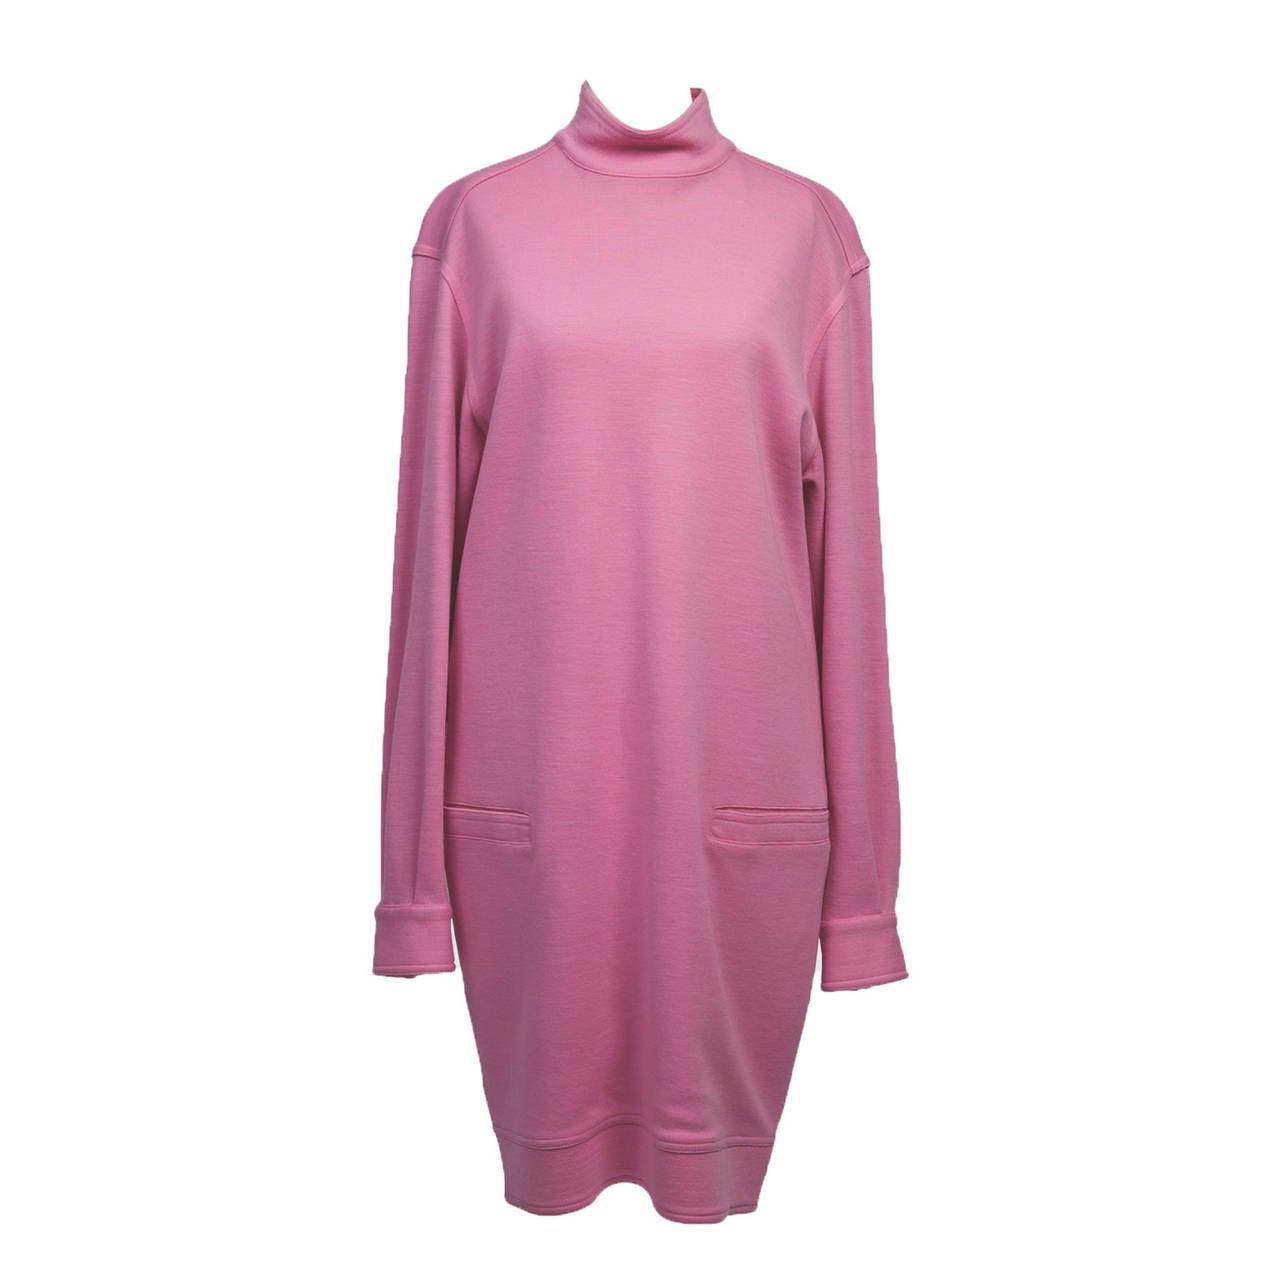 Gianni Versace Pink Dress 1990's